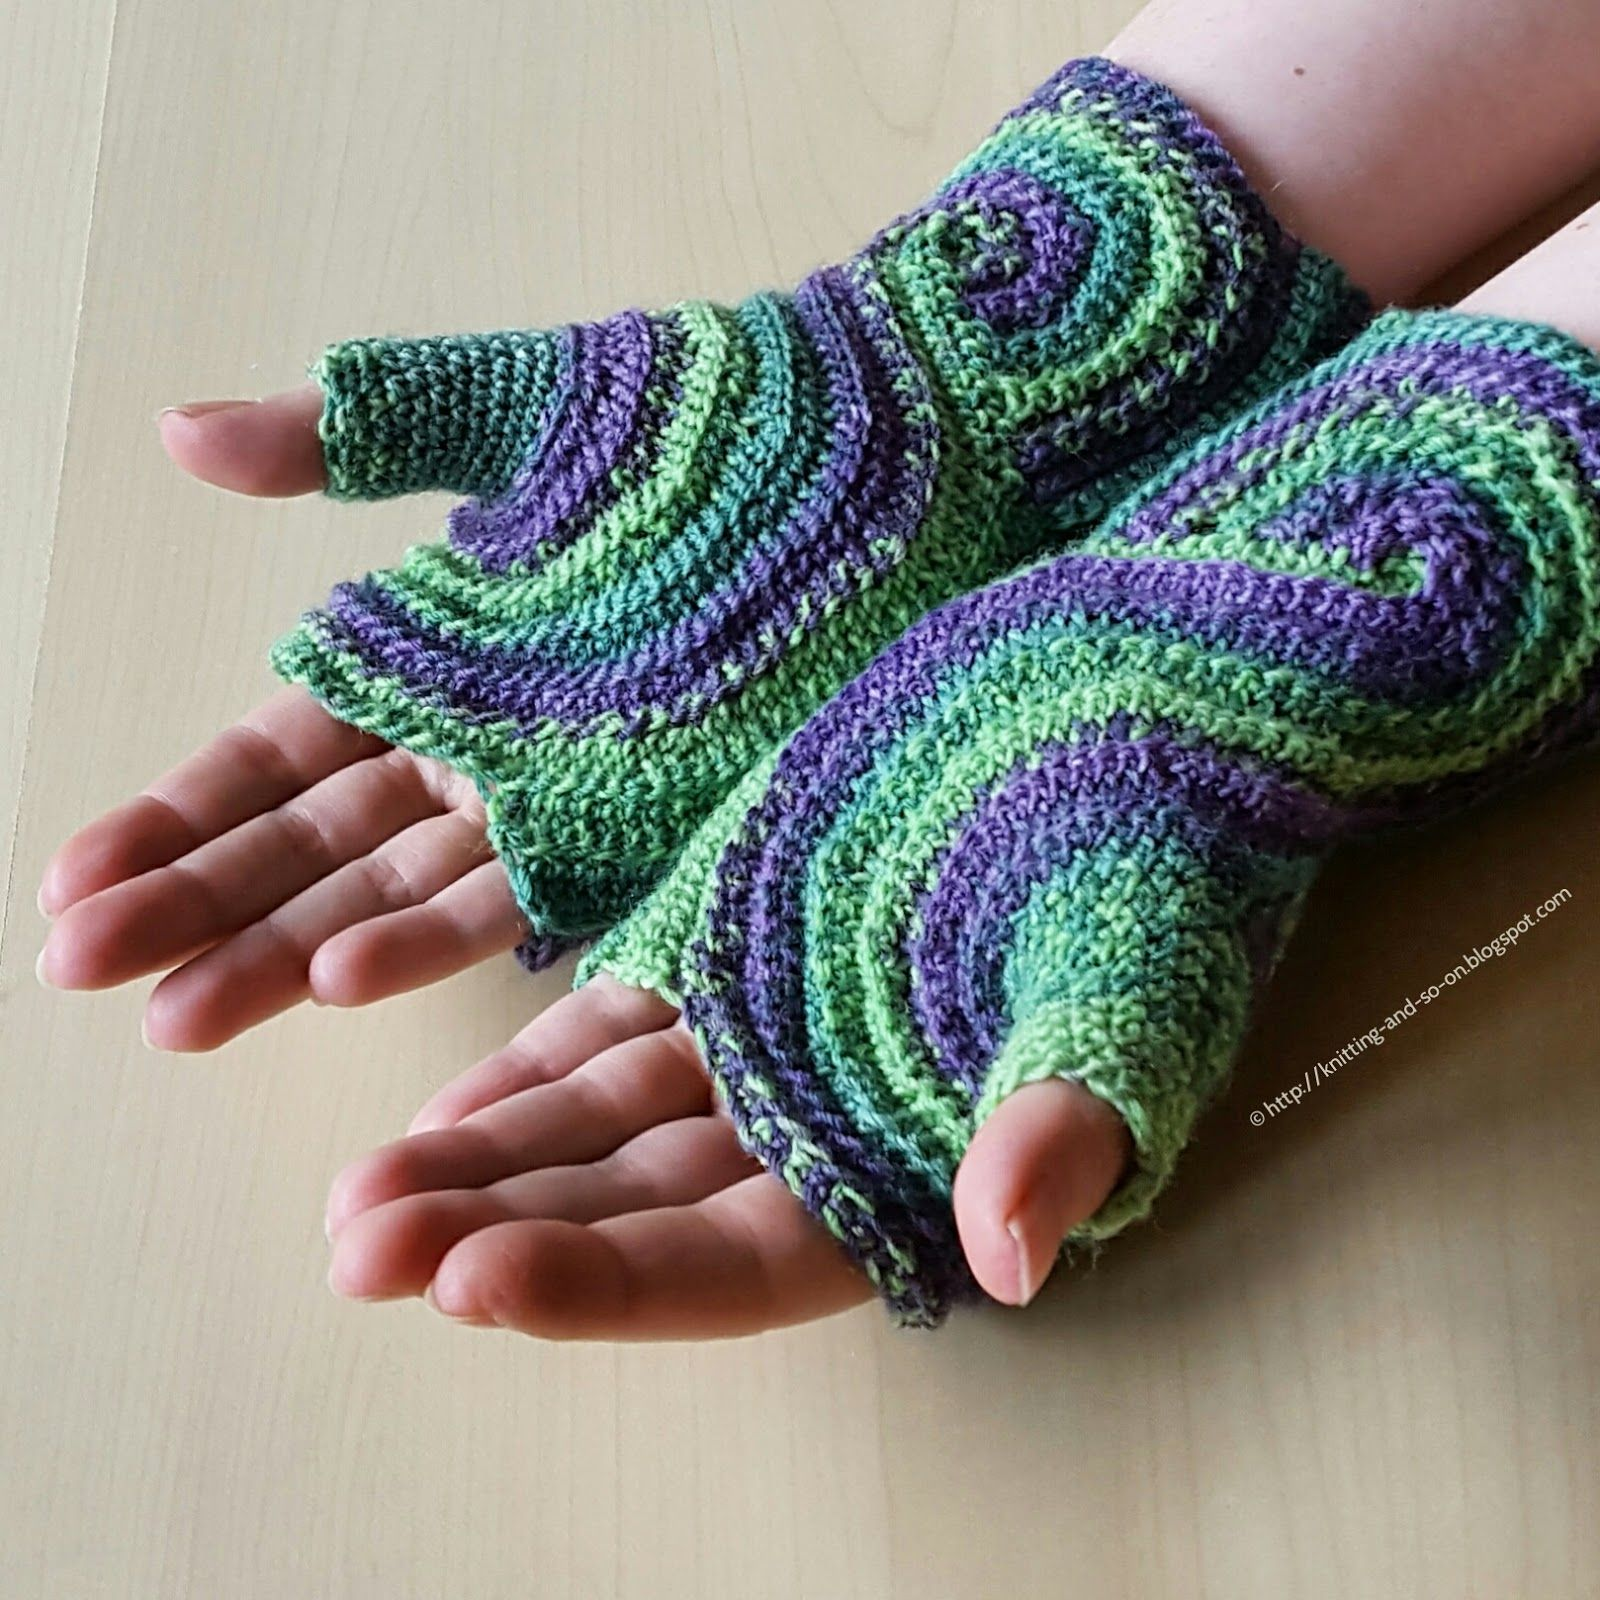 Fingerless gloves darn yarn - Octavo Fingerless Gloves Free Crochet Pattern